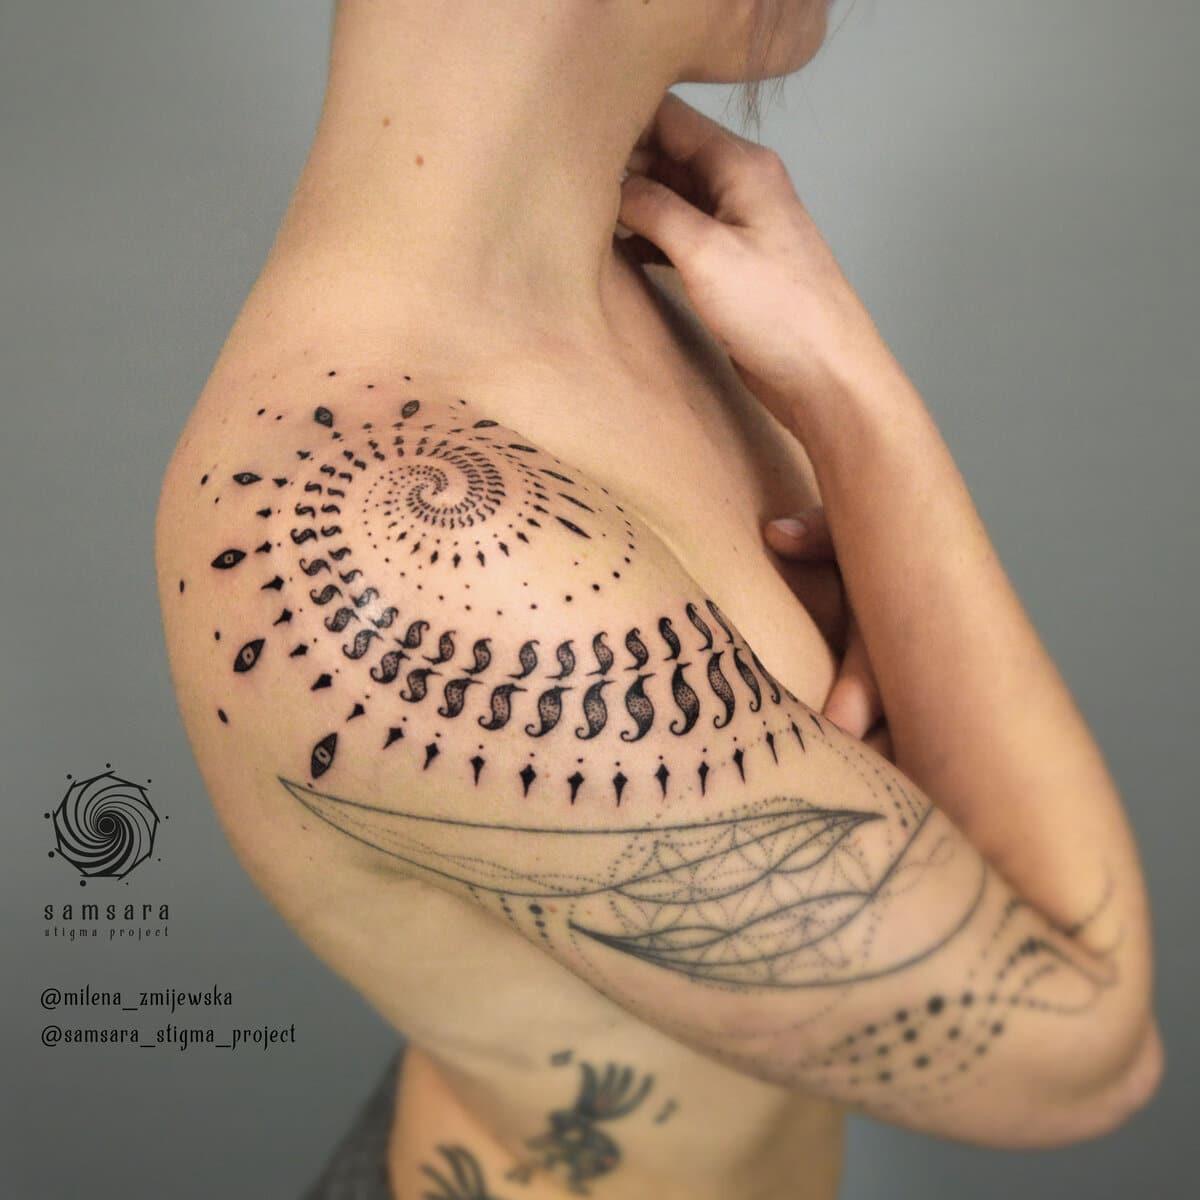 milena-zmijewska-tattoo-artist-sacred-geometry-shoulder